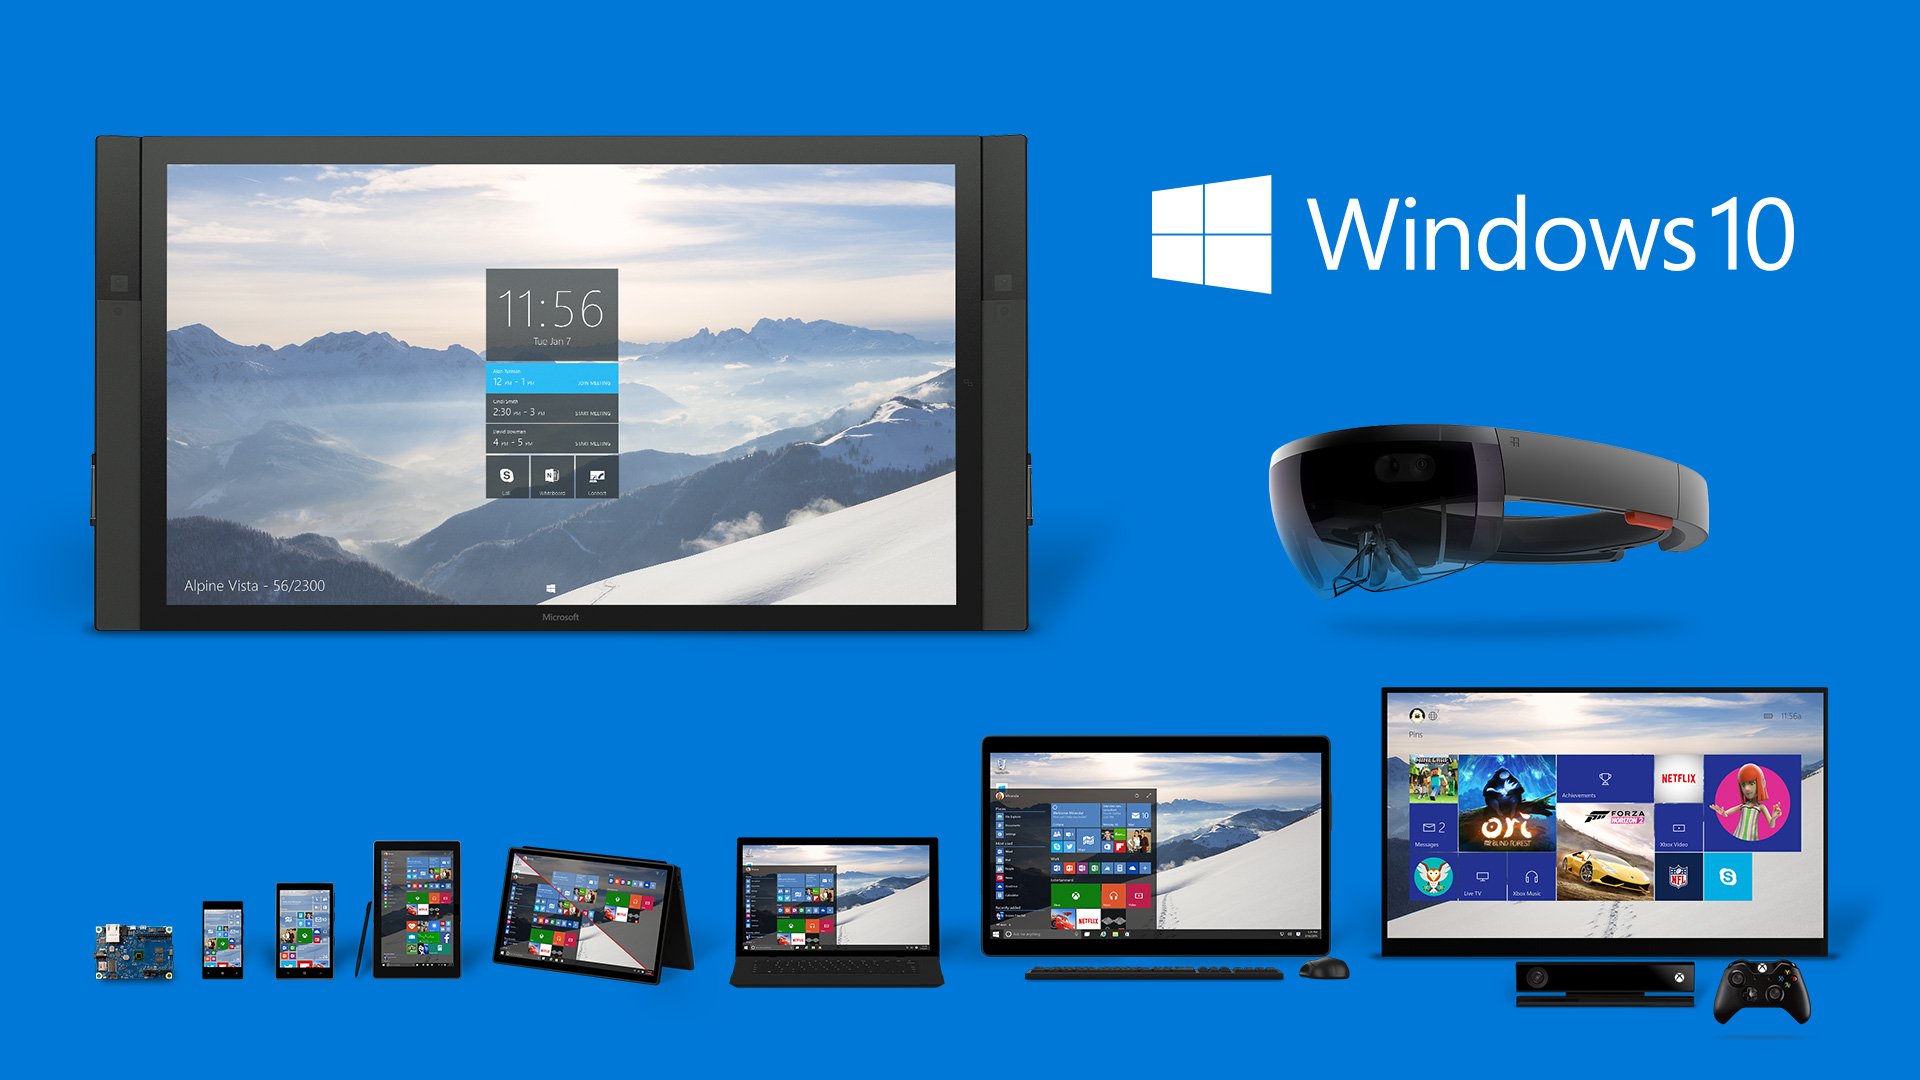 windows-10-adoption-rates-exceed-mac-os-x-apple